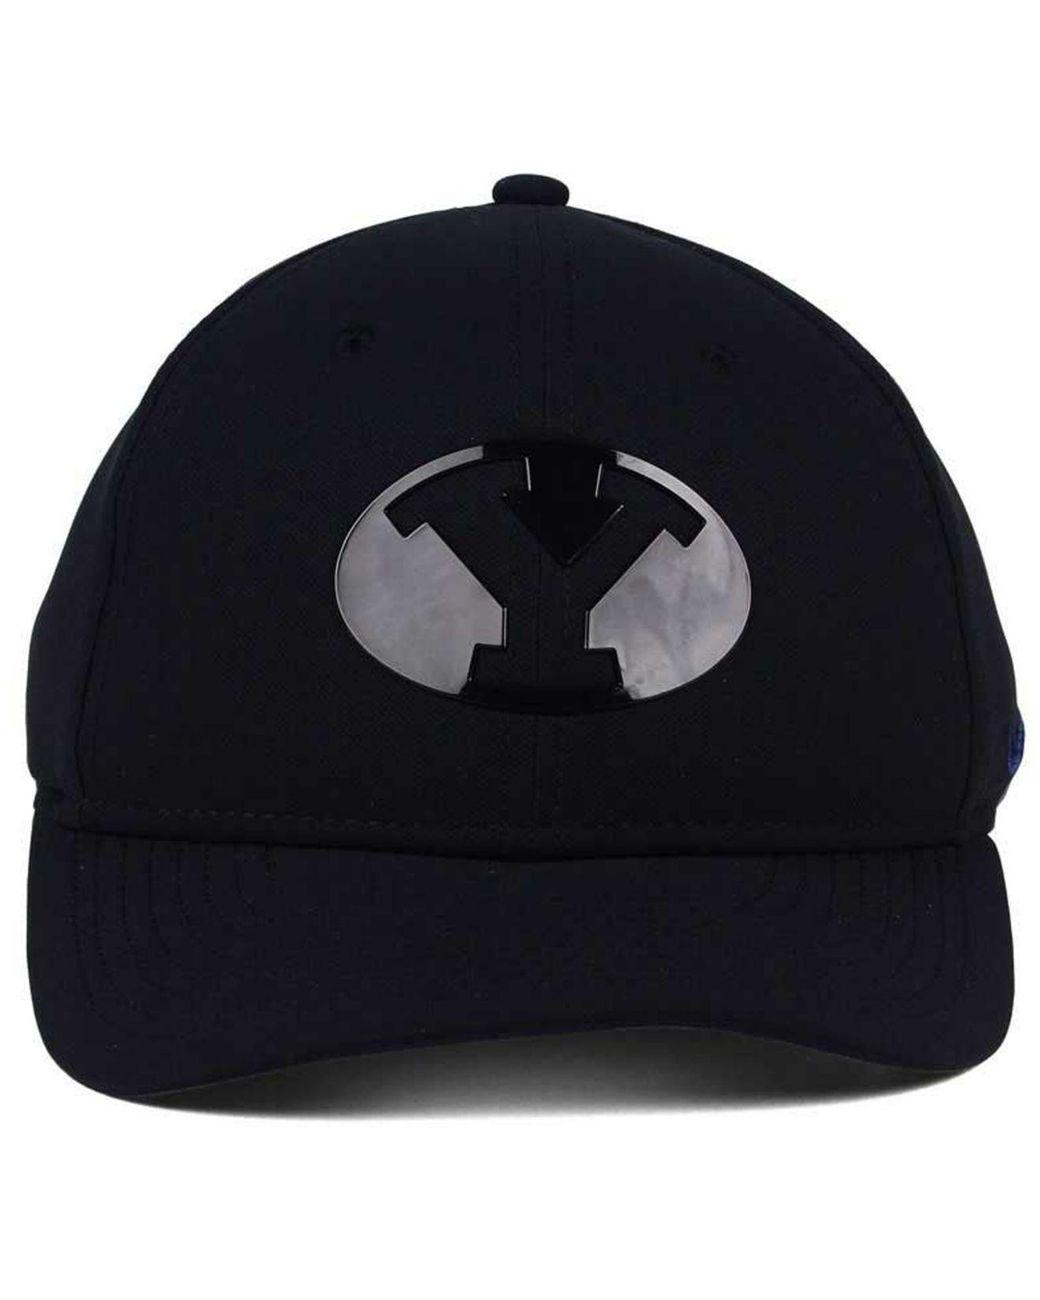 pretty nice 7fbd1 6a2e5 Nike Col Cap in Black for Men - Save 50% - Lyst